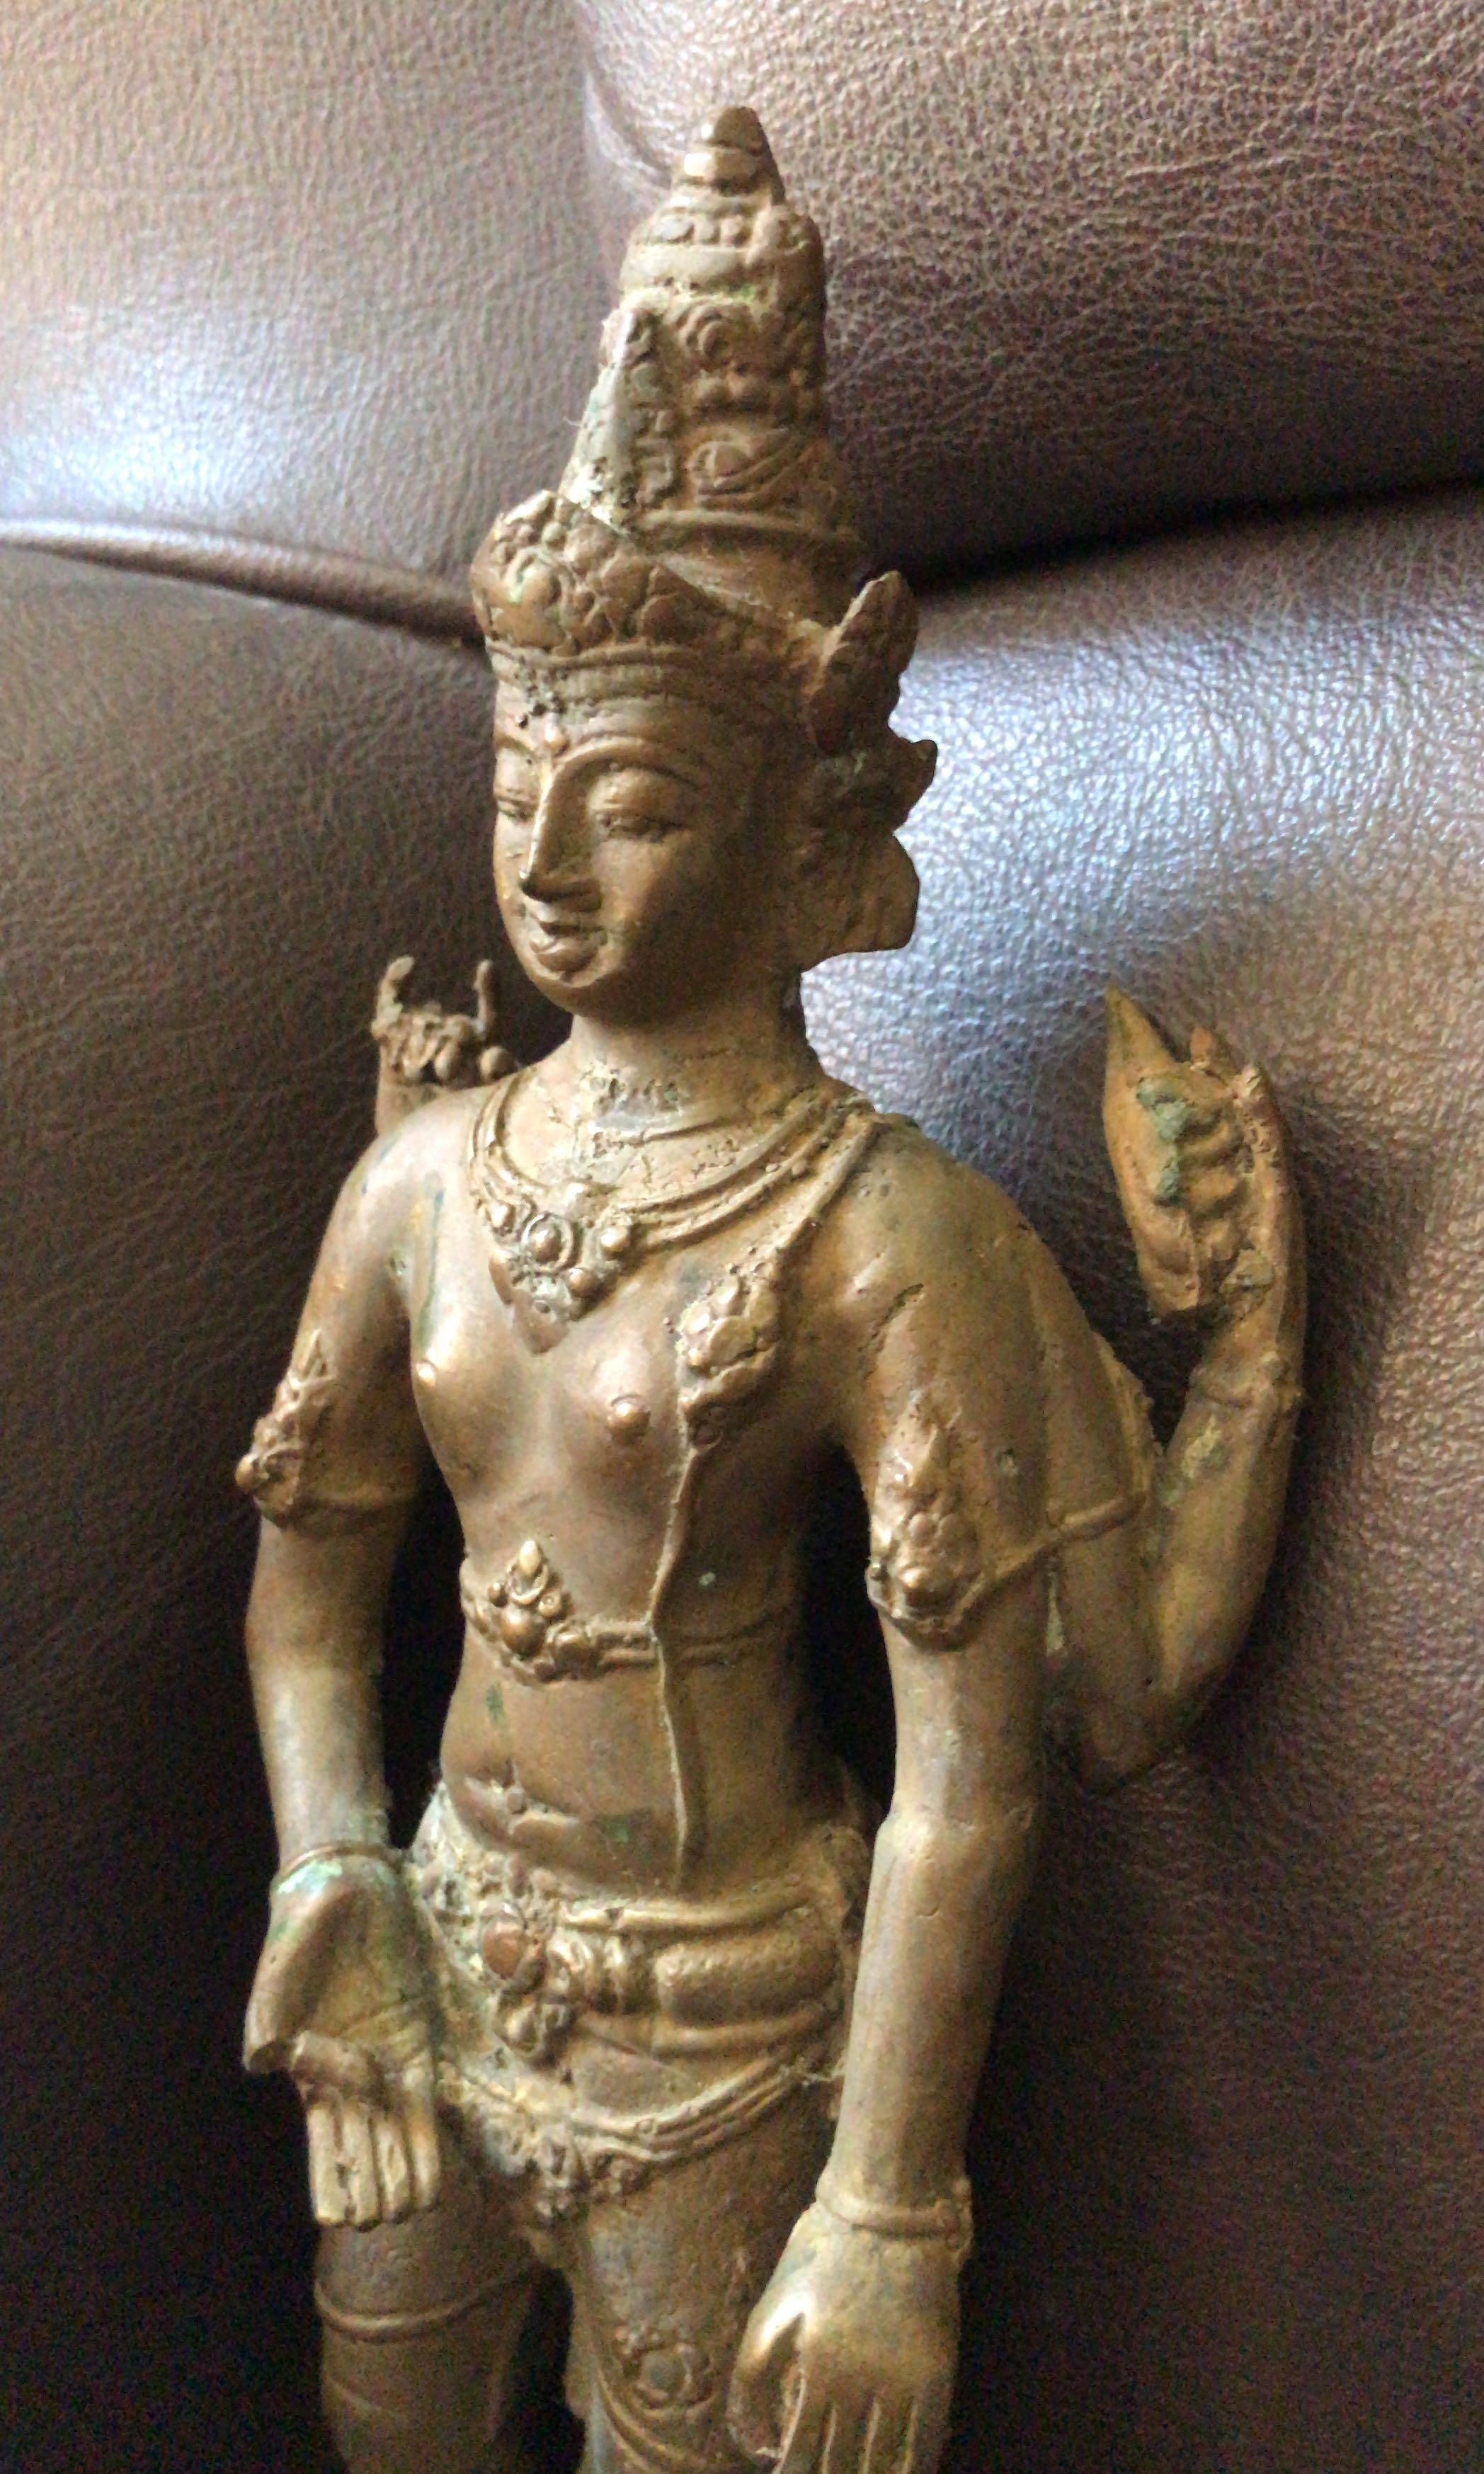 A bronze Indonesian figure Buddha statue